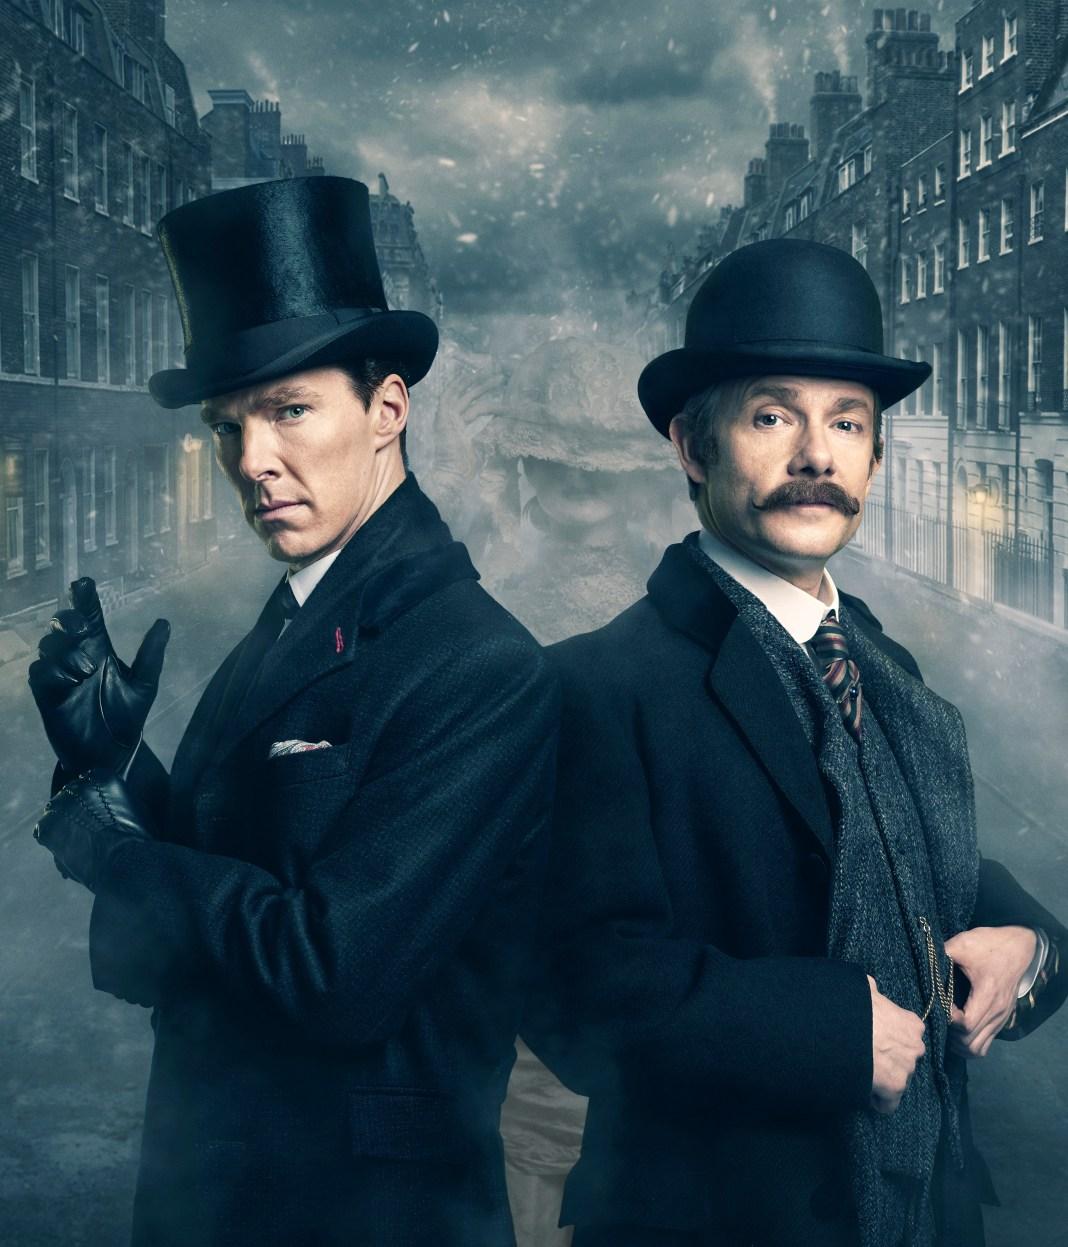 Sherlock - TX: n/a - Episode: n/a (No. n/a) - Picture Shows: Dr John Watson (MARTIN FREEMAN), Sherlock Holmes (BENEDICT CUMBERBATCH) - (C) Hartswood Films - Photographer: Robert Viglasky